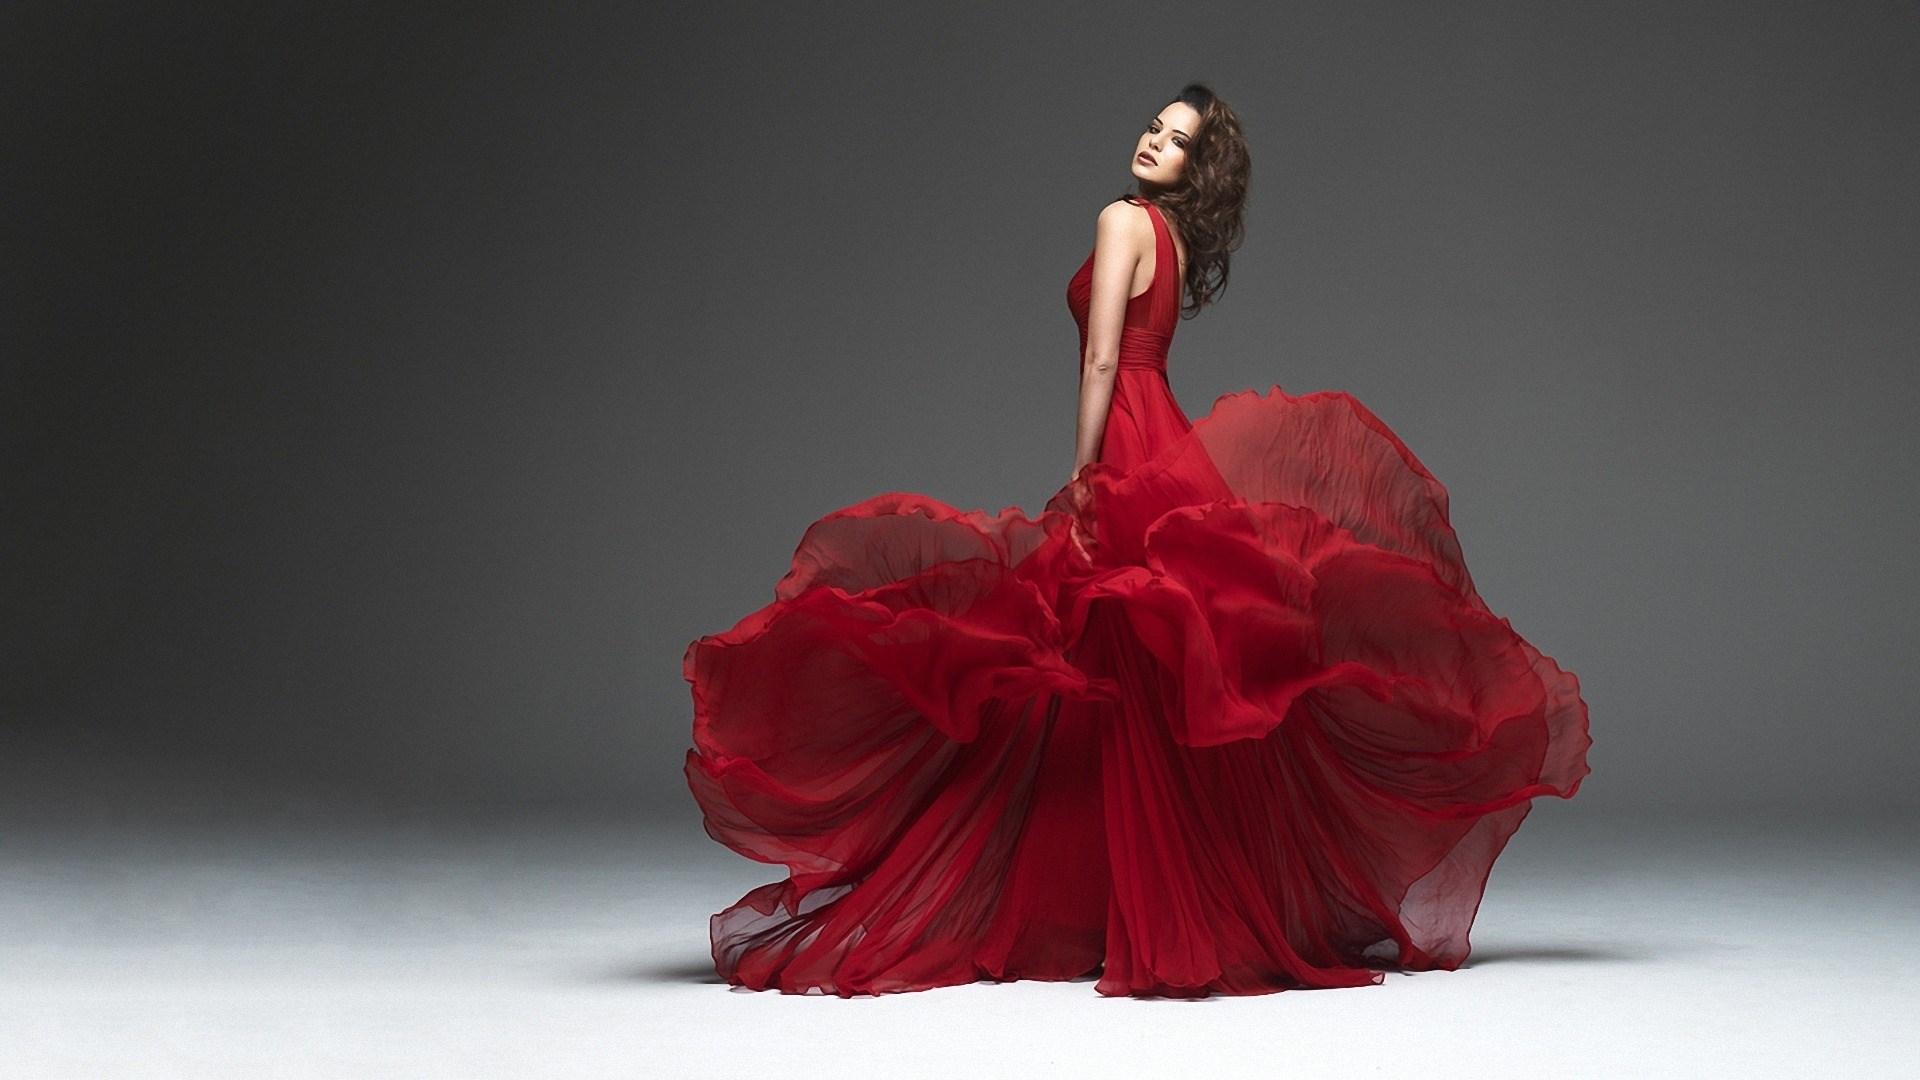 Lovely Red Dress Wallpaper 34997 1920x1080 px